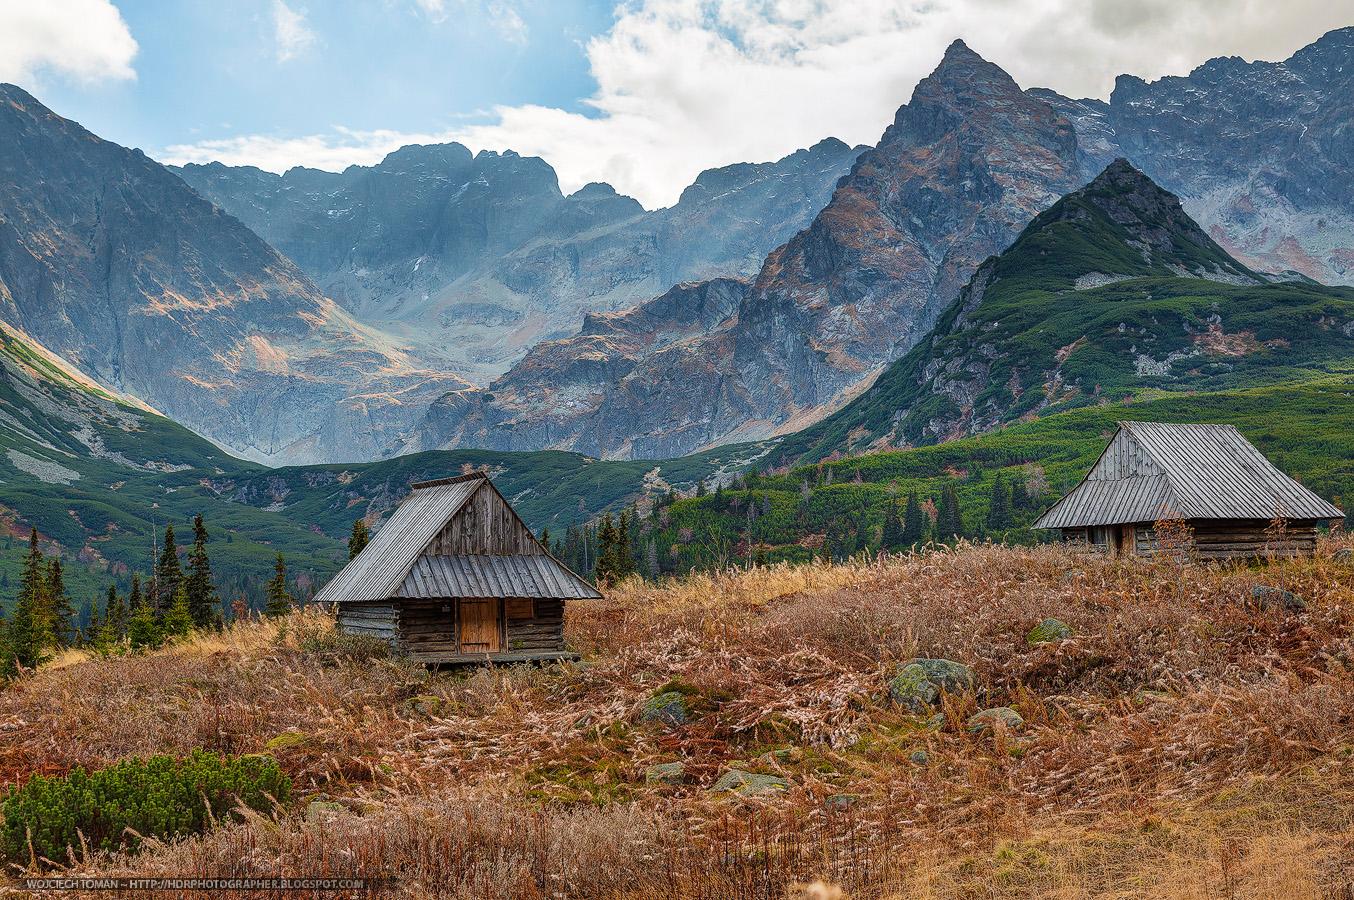 Mountain huts in Hala Gąsienicowa